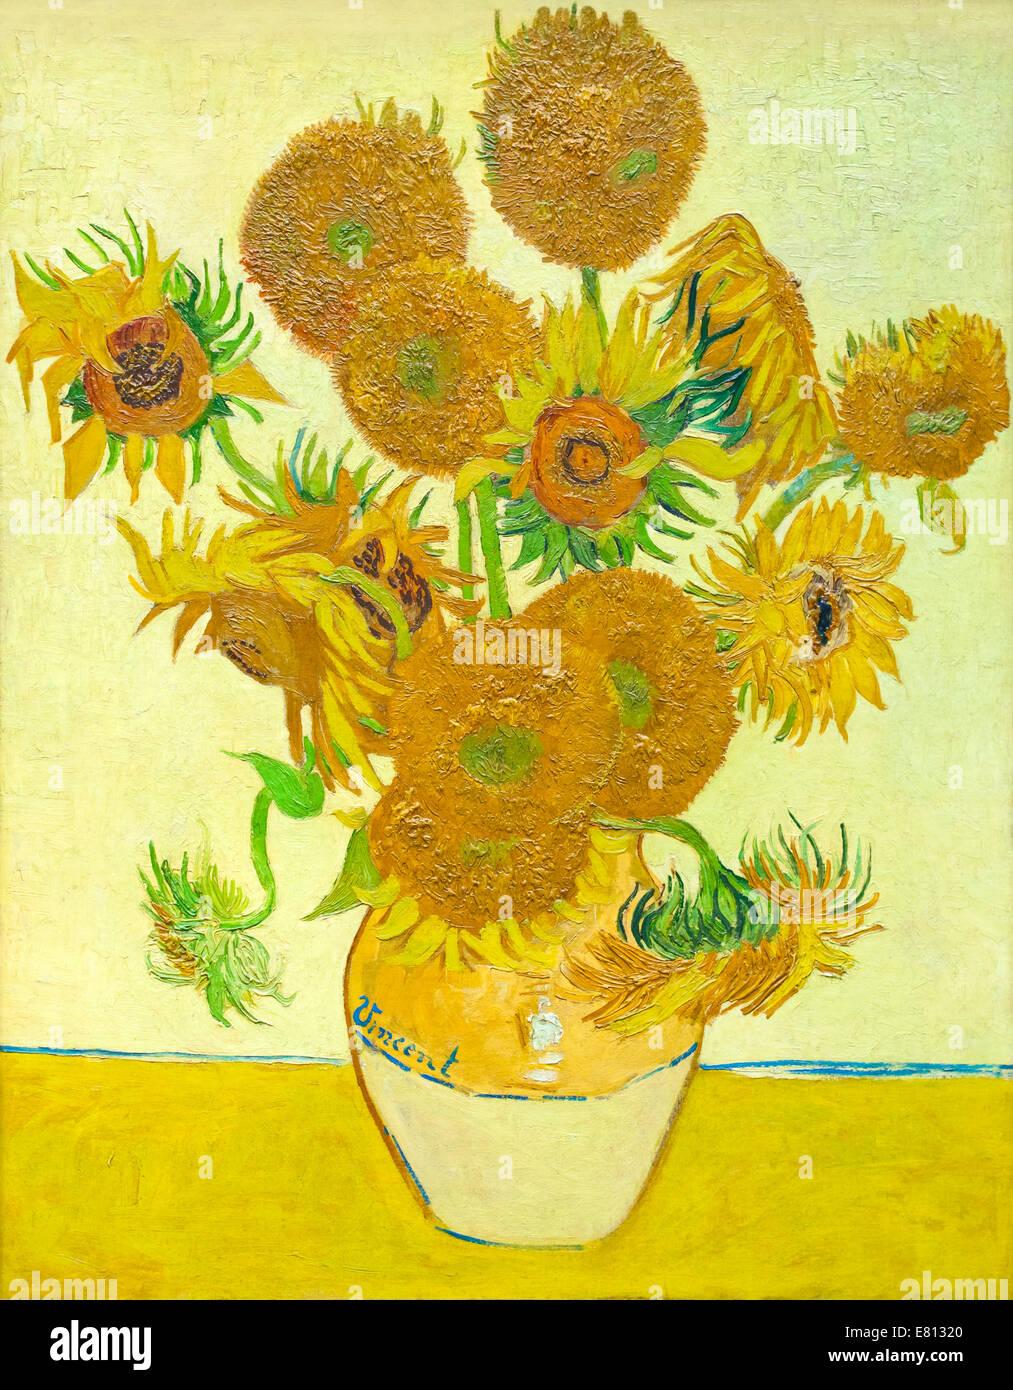 Sunflowers, Vincent van Gogh - Stock Image